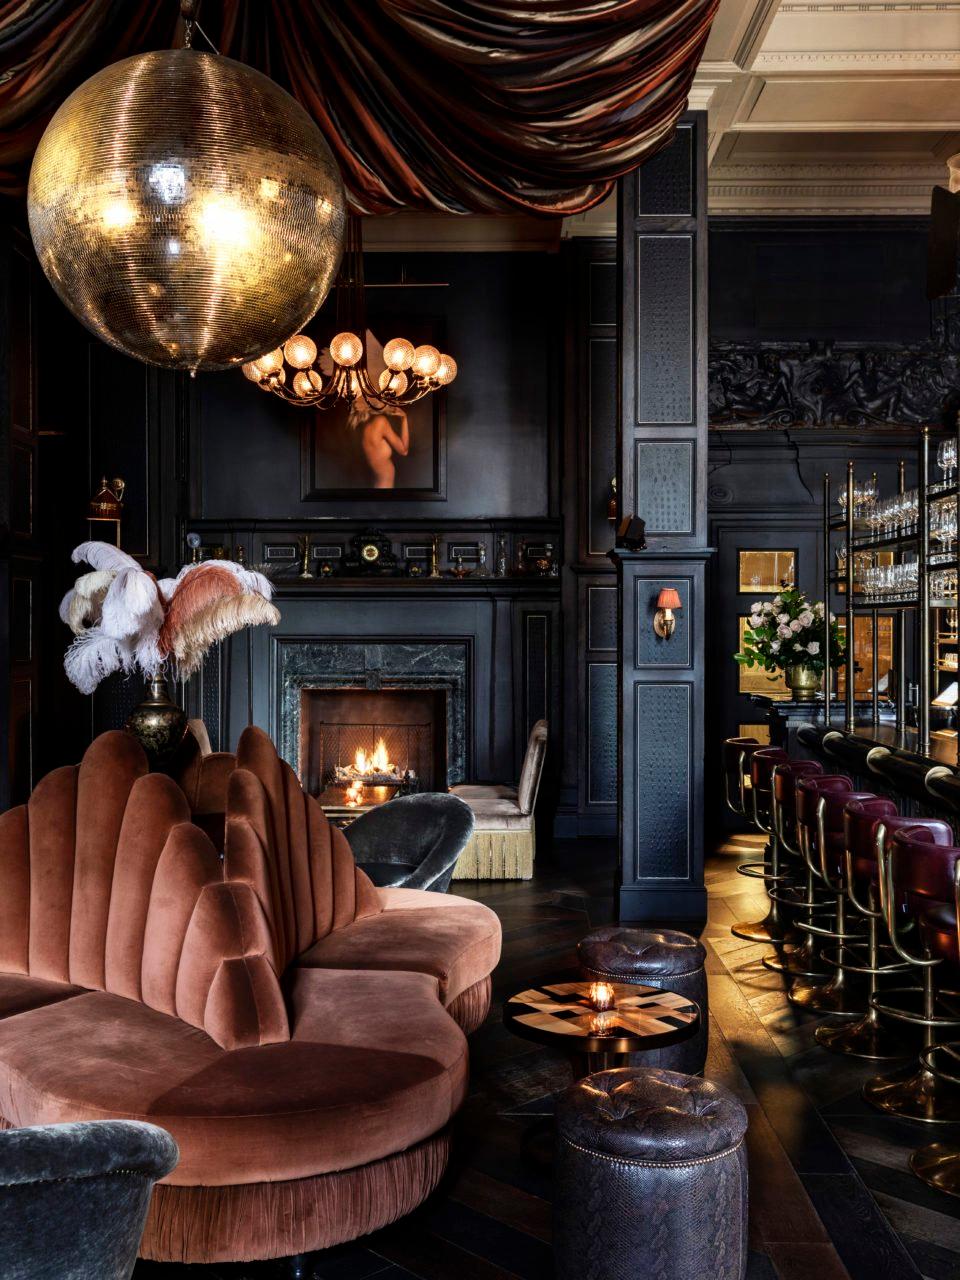 21 Of London's Most Romantic Bars - The Handbook